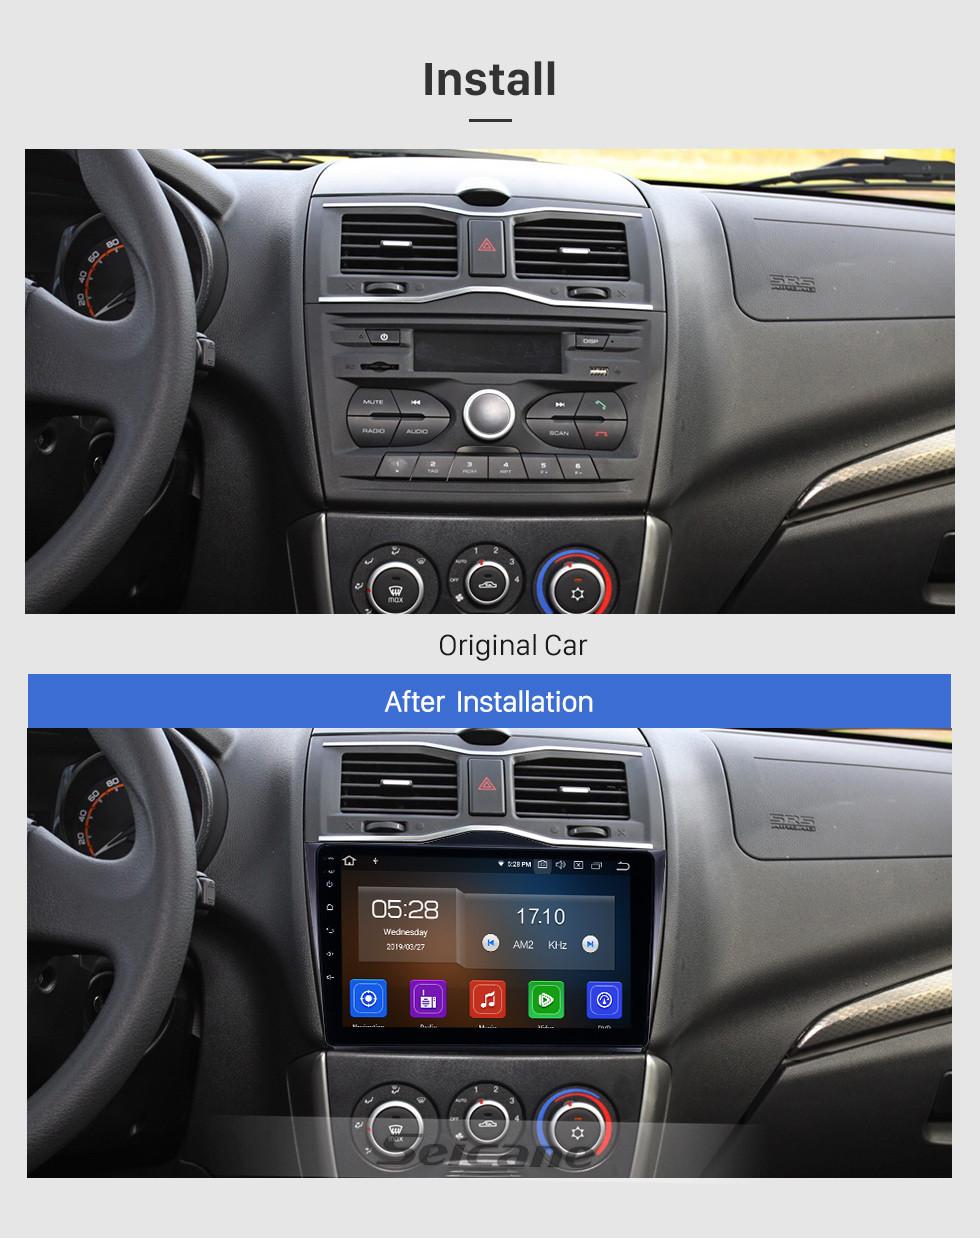 Seicane HD Touchscreen 2018-2019 Lada Granta Android 10.0 9 inch GPS Navigation Radio Bluetooth WIFI AUX USB Carplay support DAB+ DVR OBD2